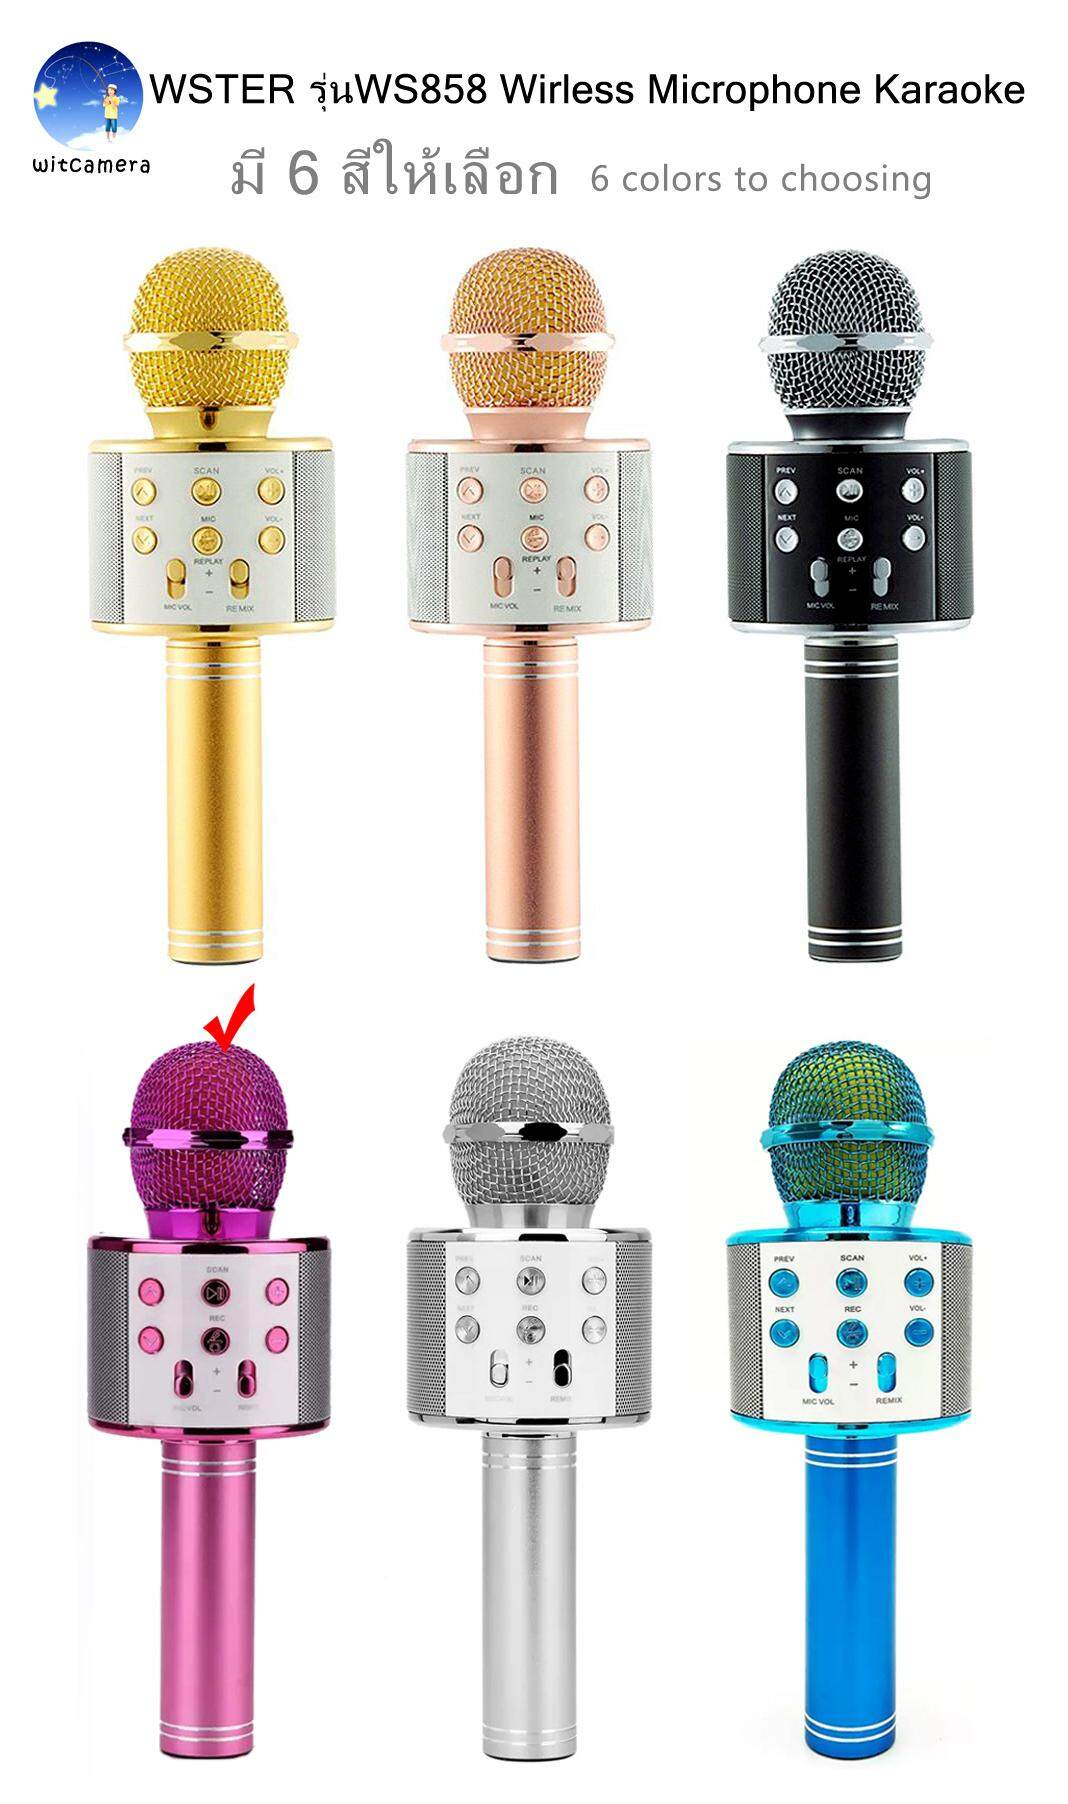 Wster รุ่นws858 Wirless Microphone Karaoke ลำโพง ไมค์ ไมค์ลอย ไมค์ไร้สาย คาราโอเกะ บลูทูธ(มี 6 สีให้เลือก ) Wster Version Ws858 Wirless Microphone Karaoke Speakers, Mike, Floating, Wireless Mike, Karaoke, Bluetooth( 6 Colors To Choosing ) By Witcamera.